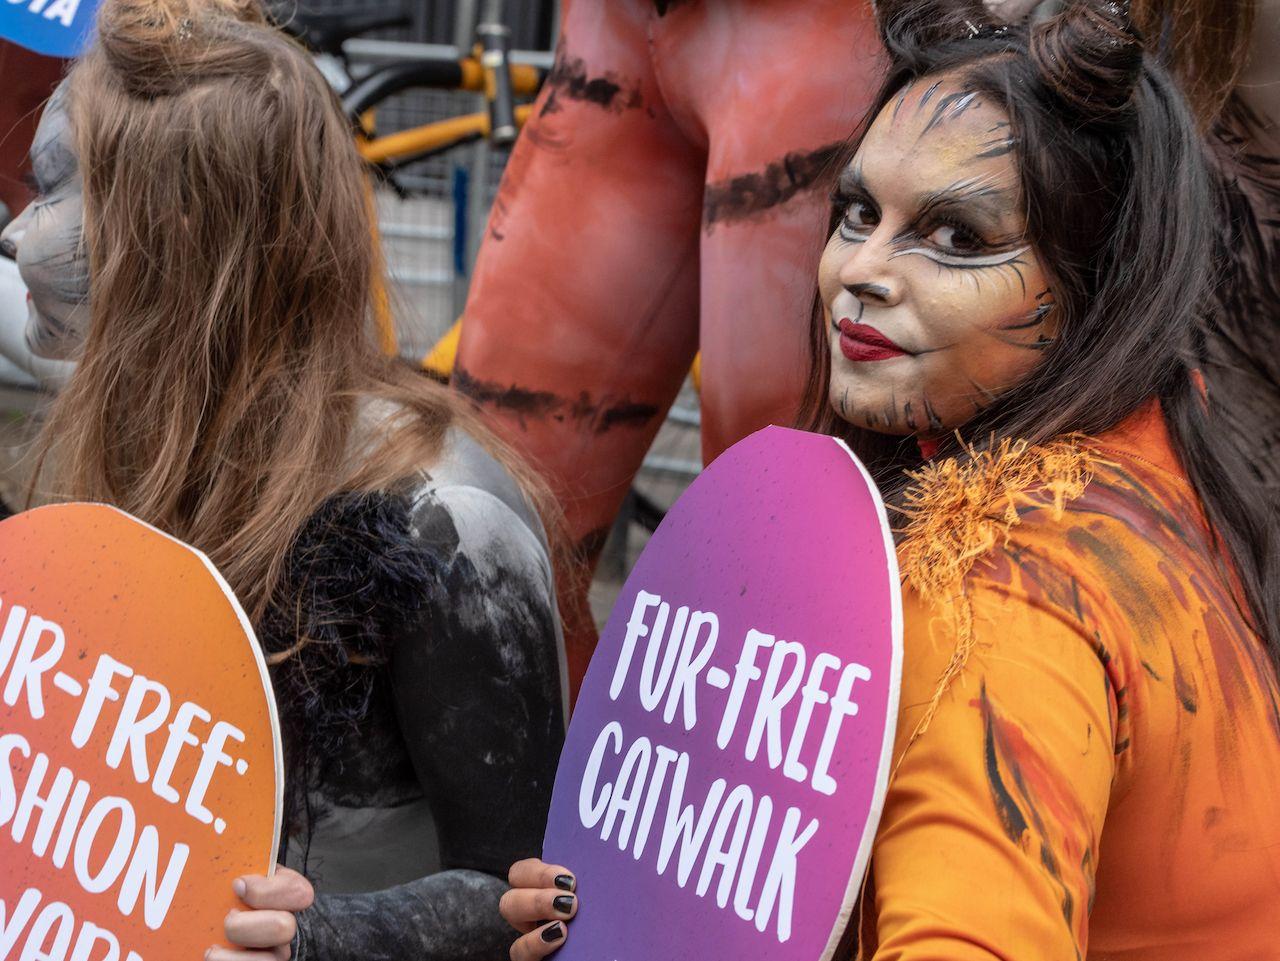 PETA demonstrators in cat outfits celebrate a No Fur fashion week in London